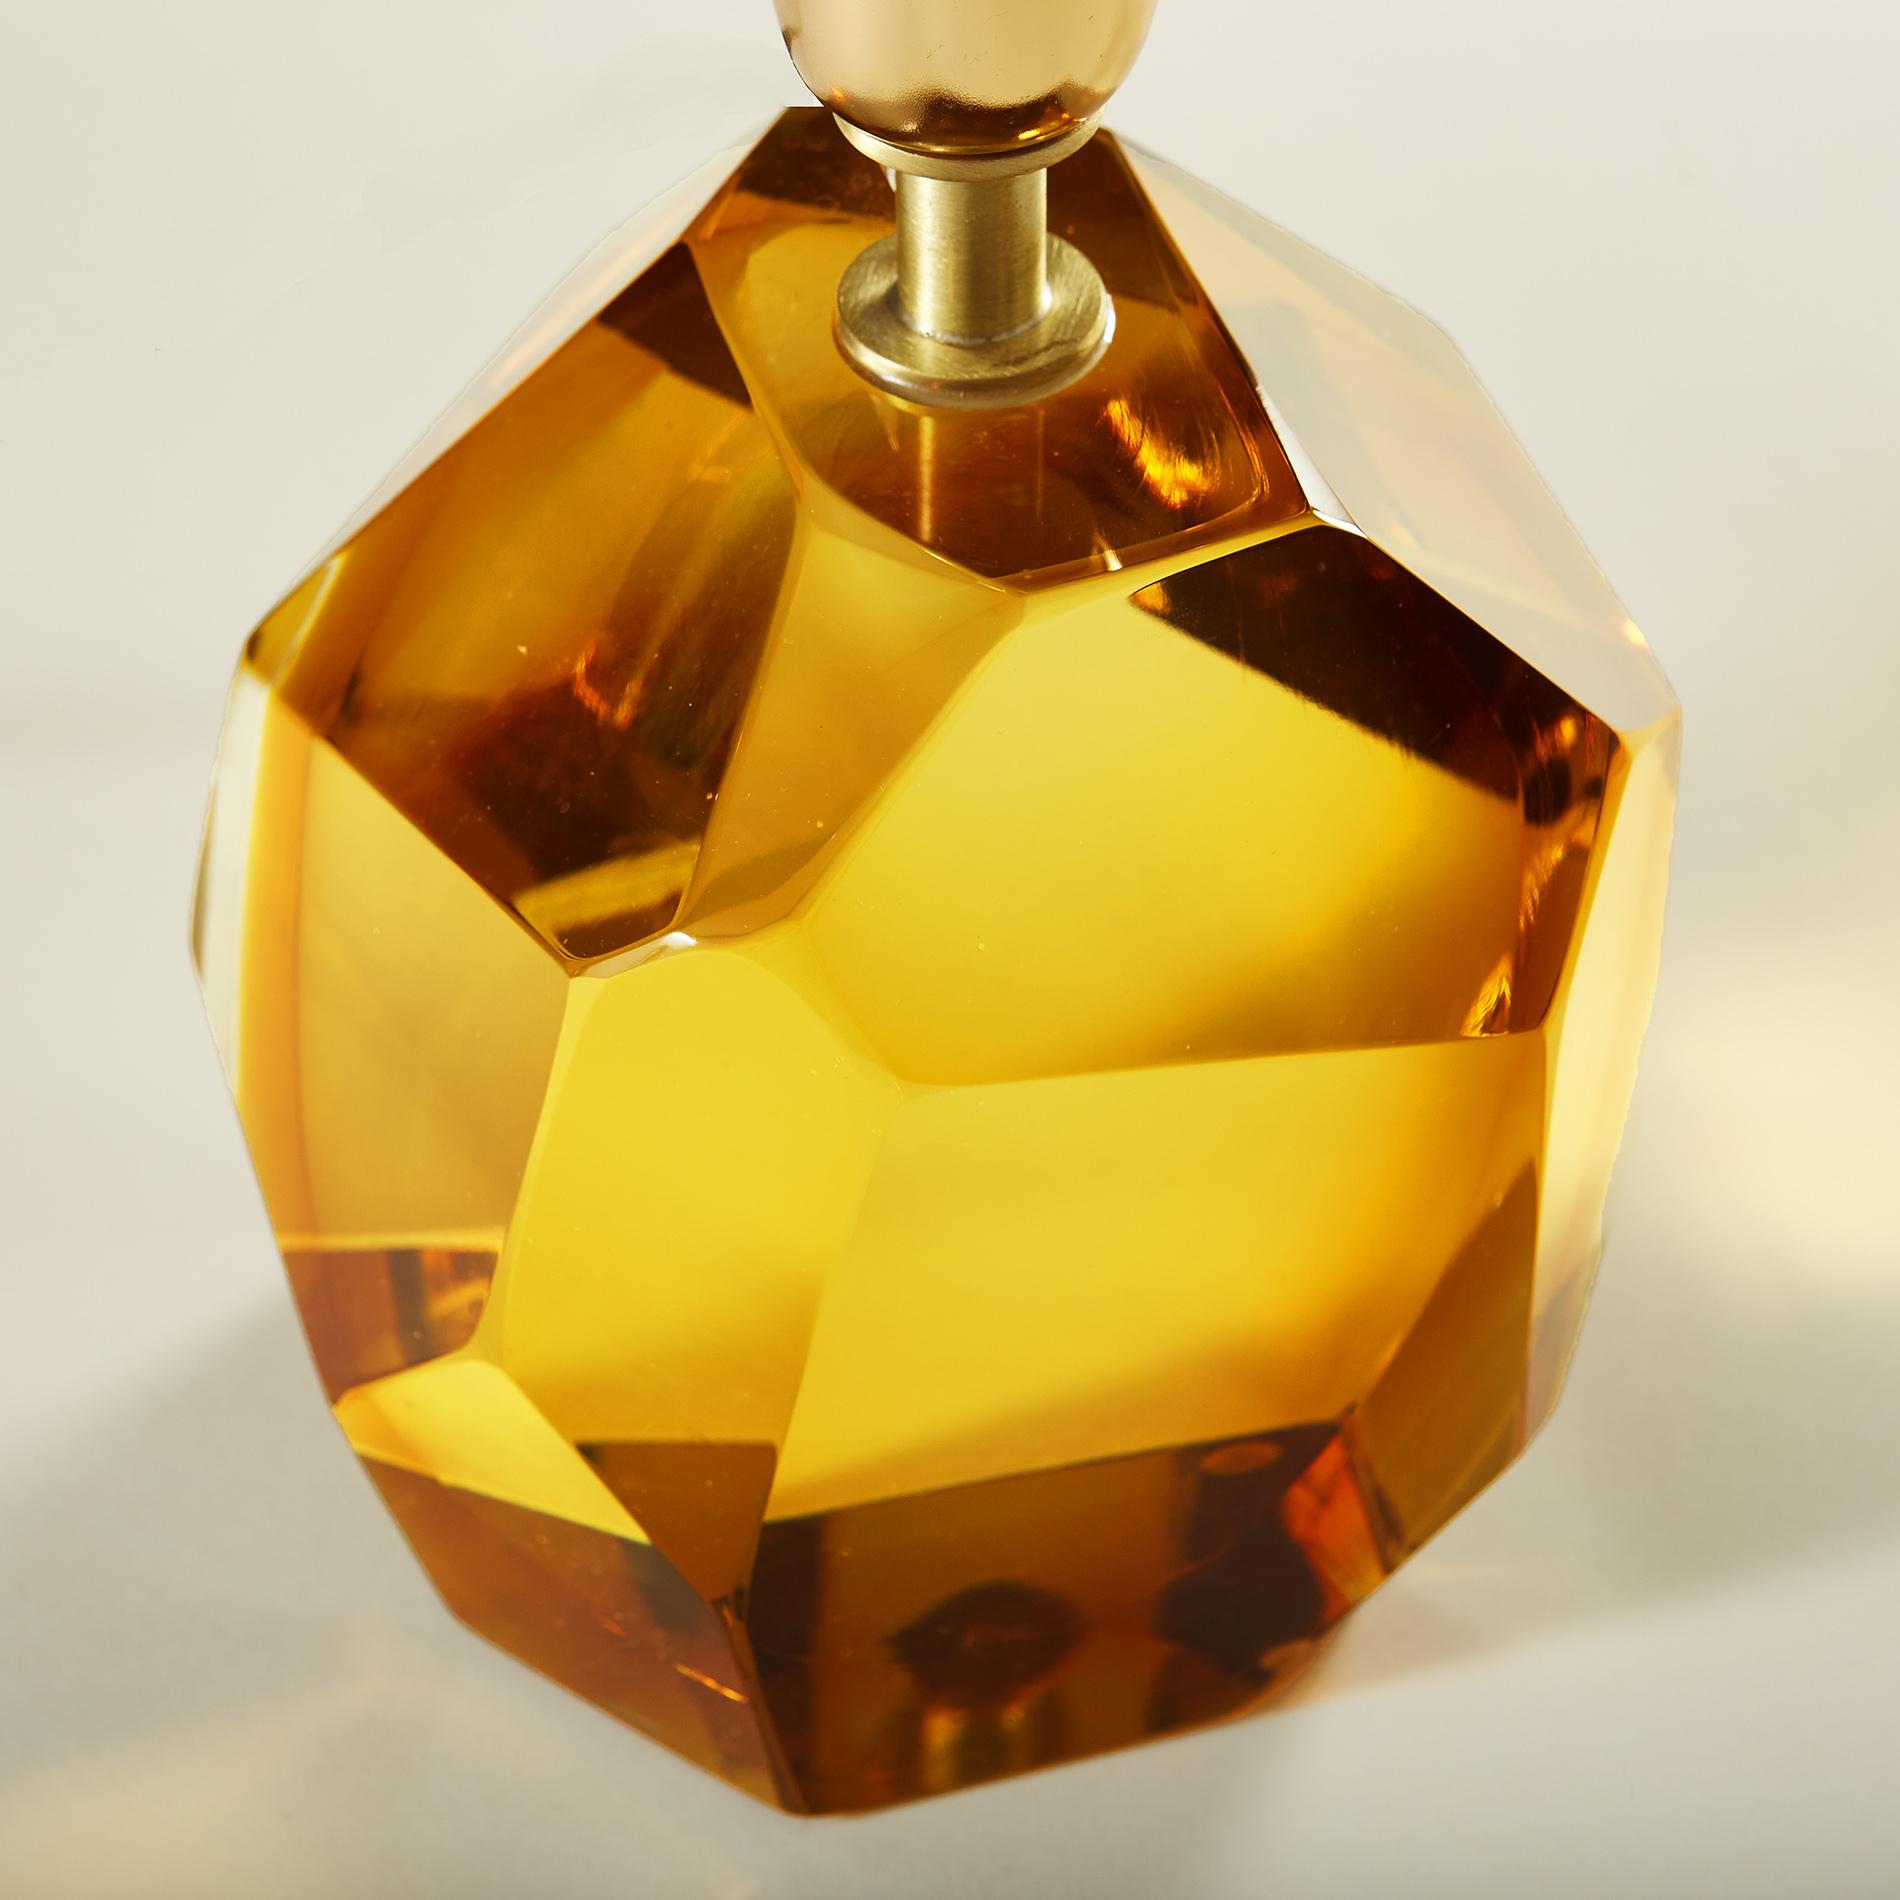 Amber Rock Lamp 20210225 Valerie Wade 3 060 V1